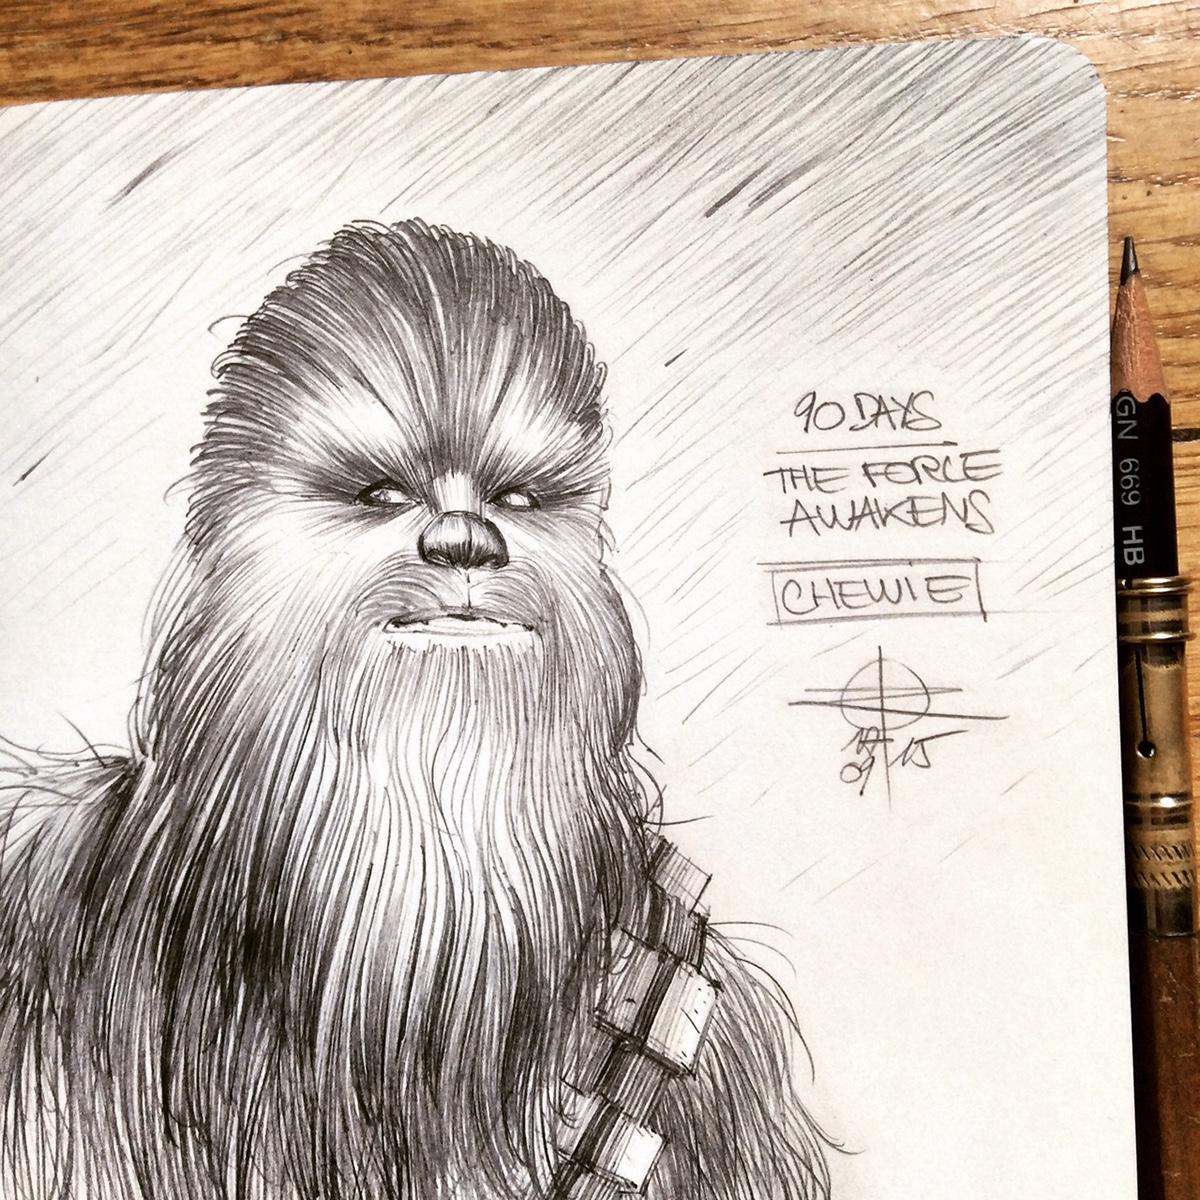 Adobe Portfolio star wars The Force Awakens countdown sketchbook moleskine millennium falcon kylo ren darth vader jedi lightsaber Han Solo luke skywalker rey Finn poe dameron